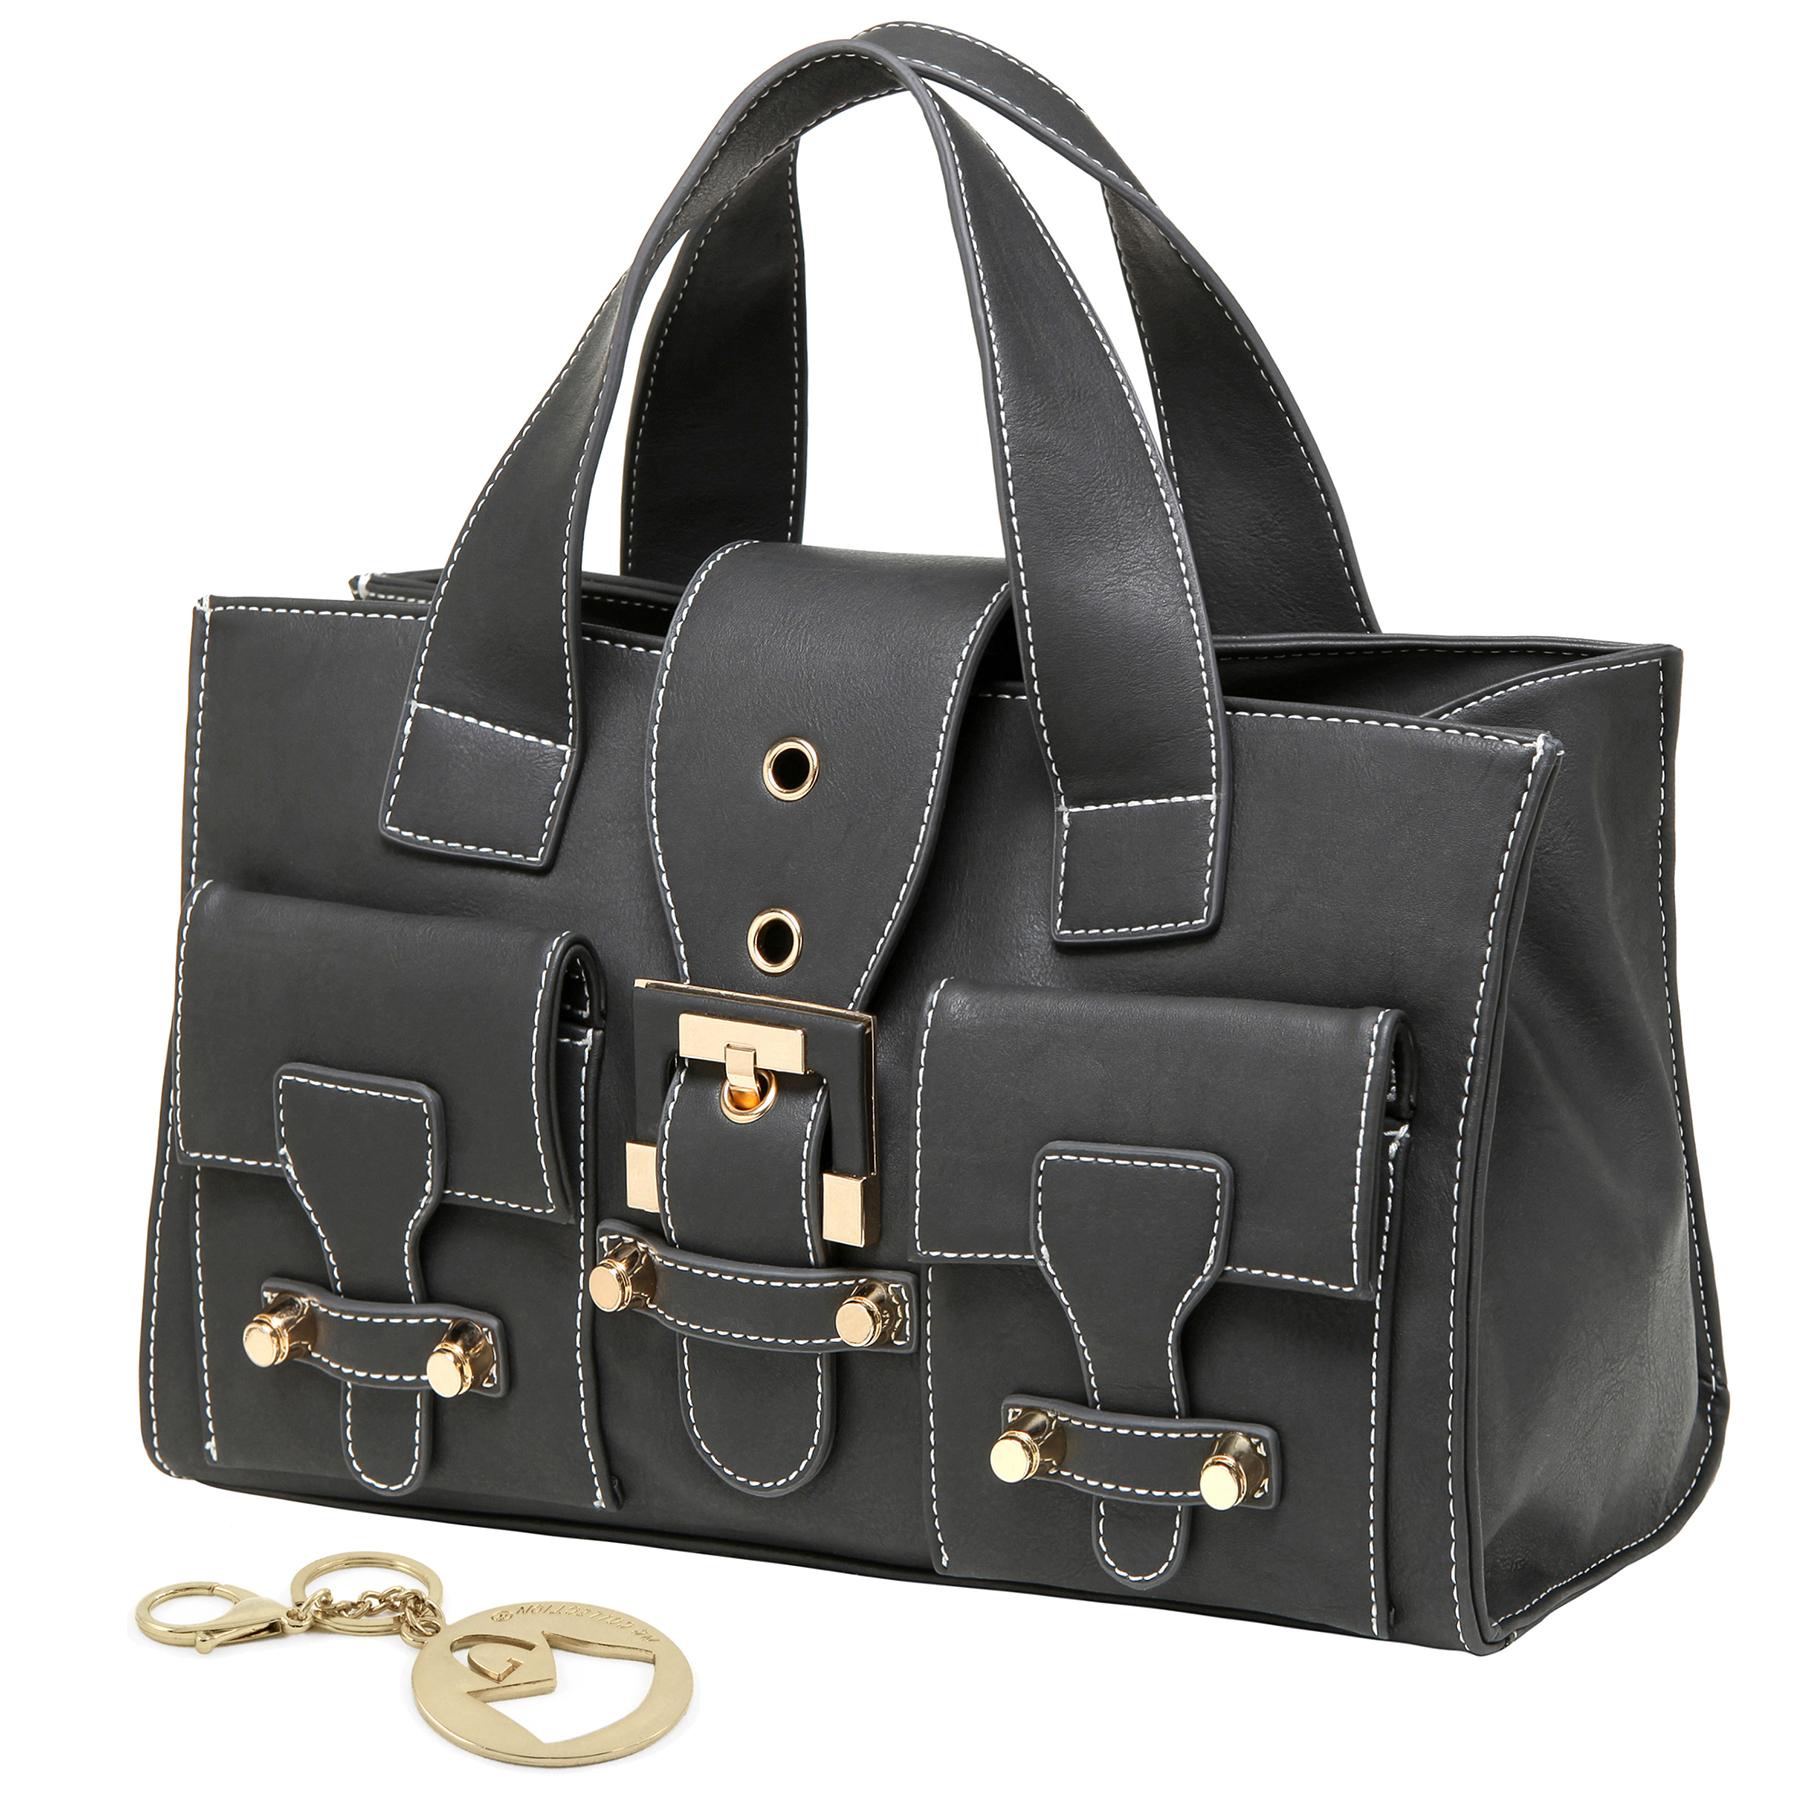 Anna Onyx Black satchel style womens designer handbag main image